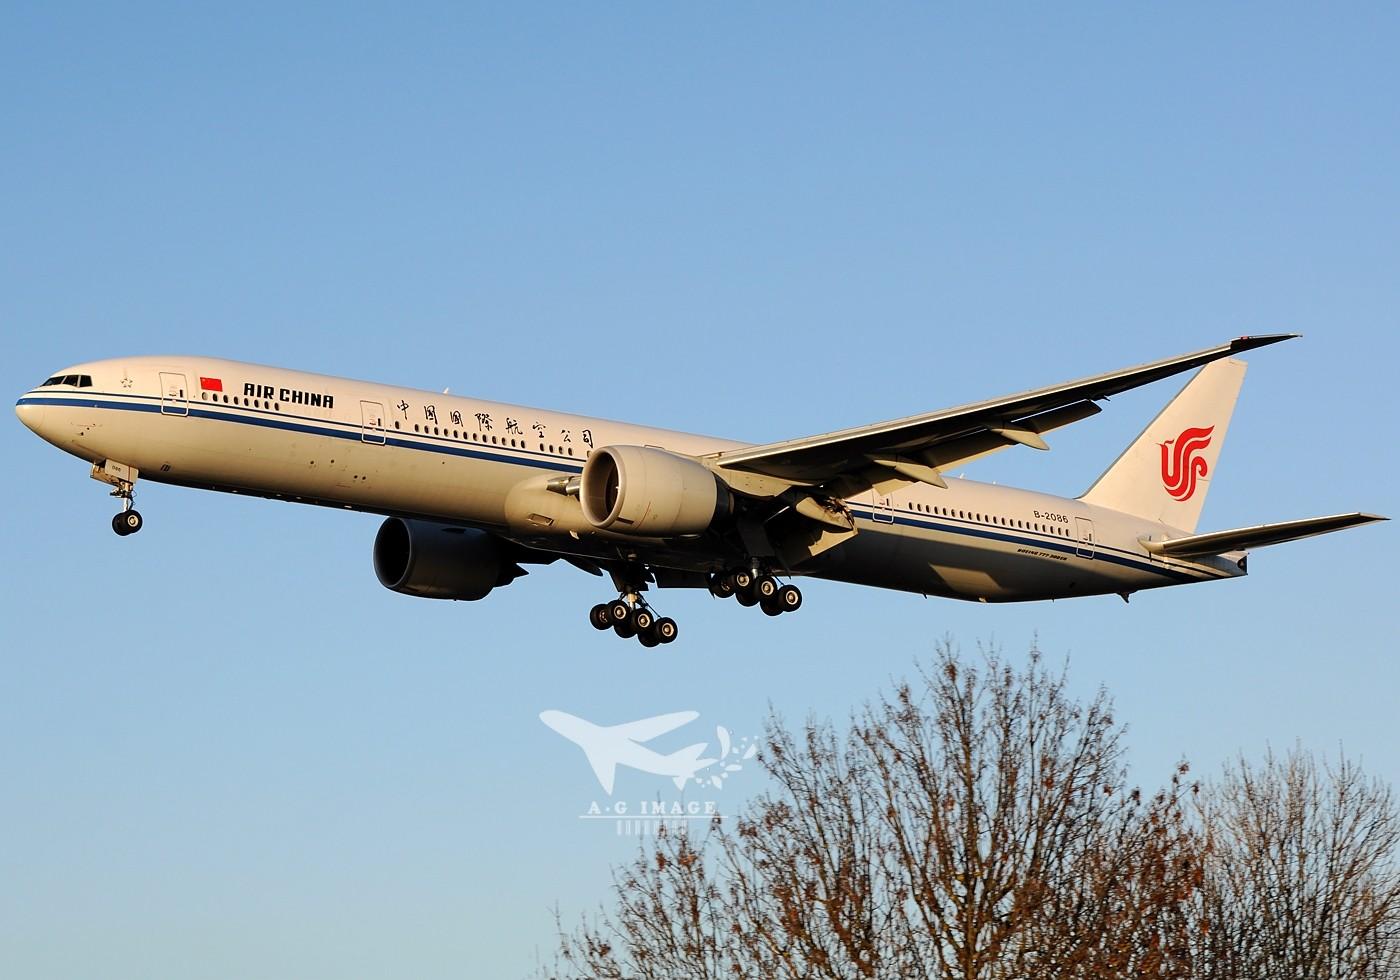 Re:[原创]【七彩天空】--八张来自LHR的77w大图,看到血脉喷张! BOEING 777-300 B-2086 英国伦敦希思罗机场